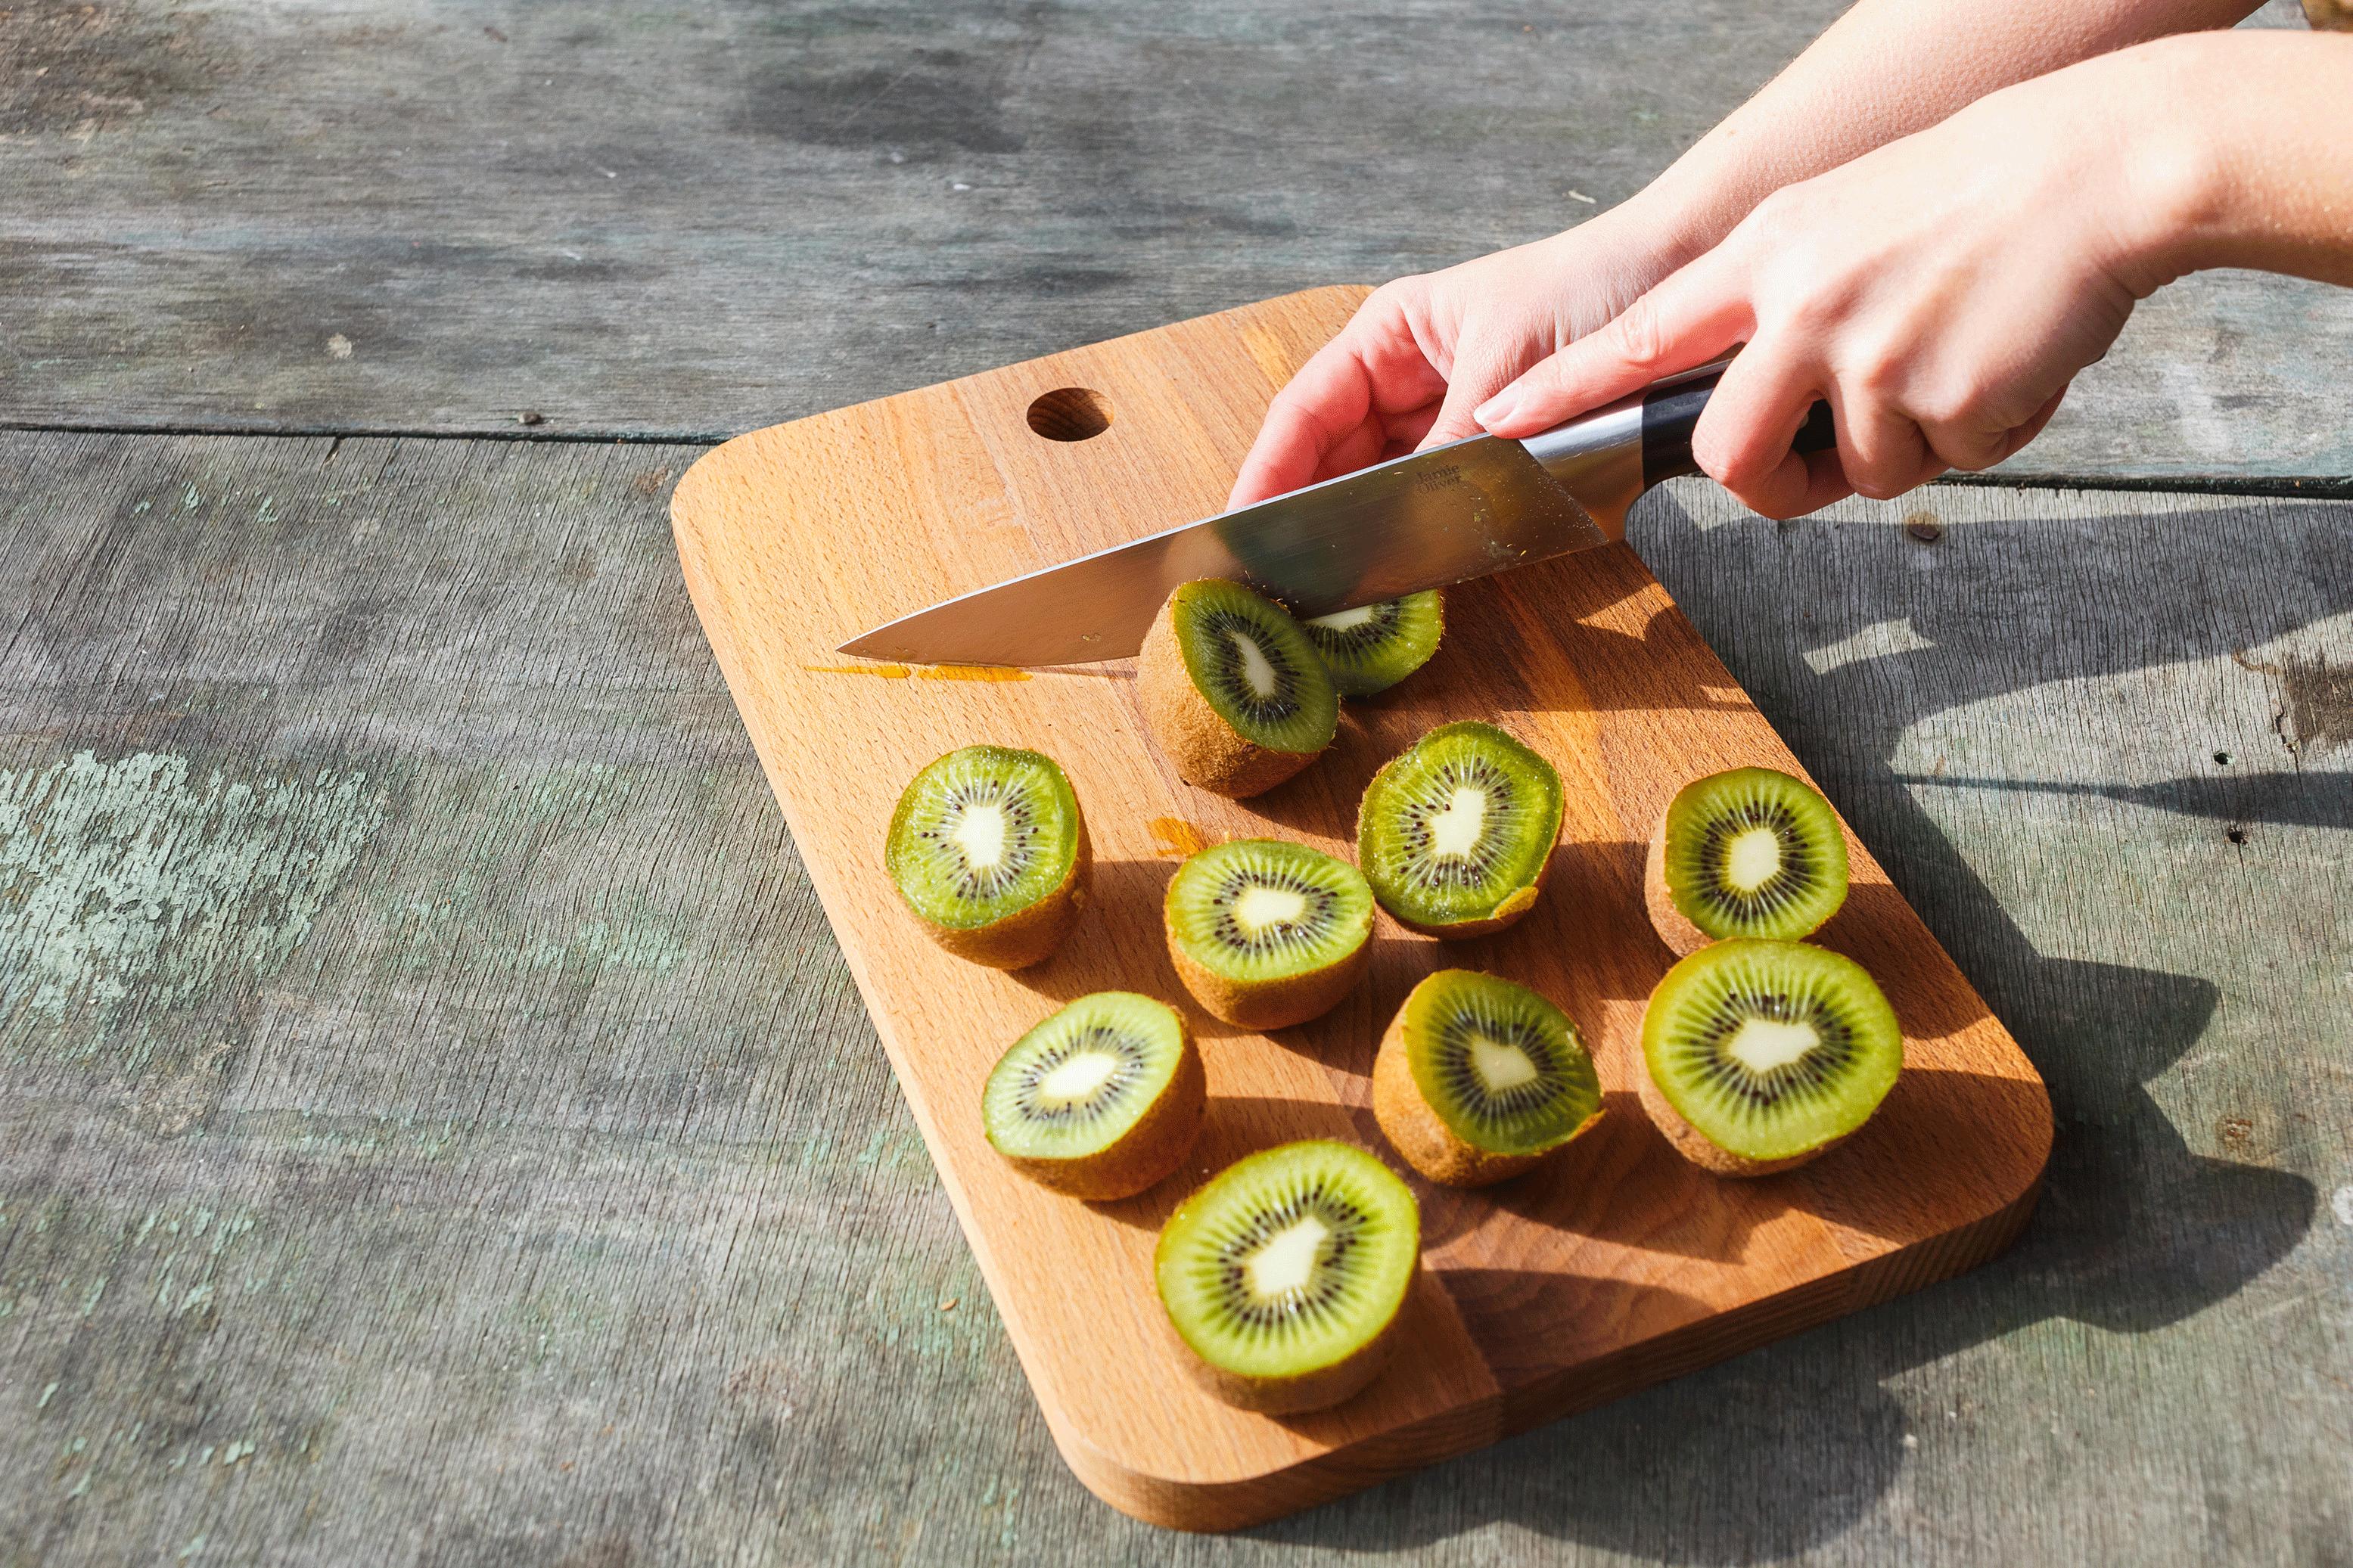 Conservar fruta cortada